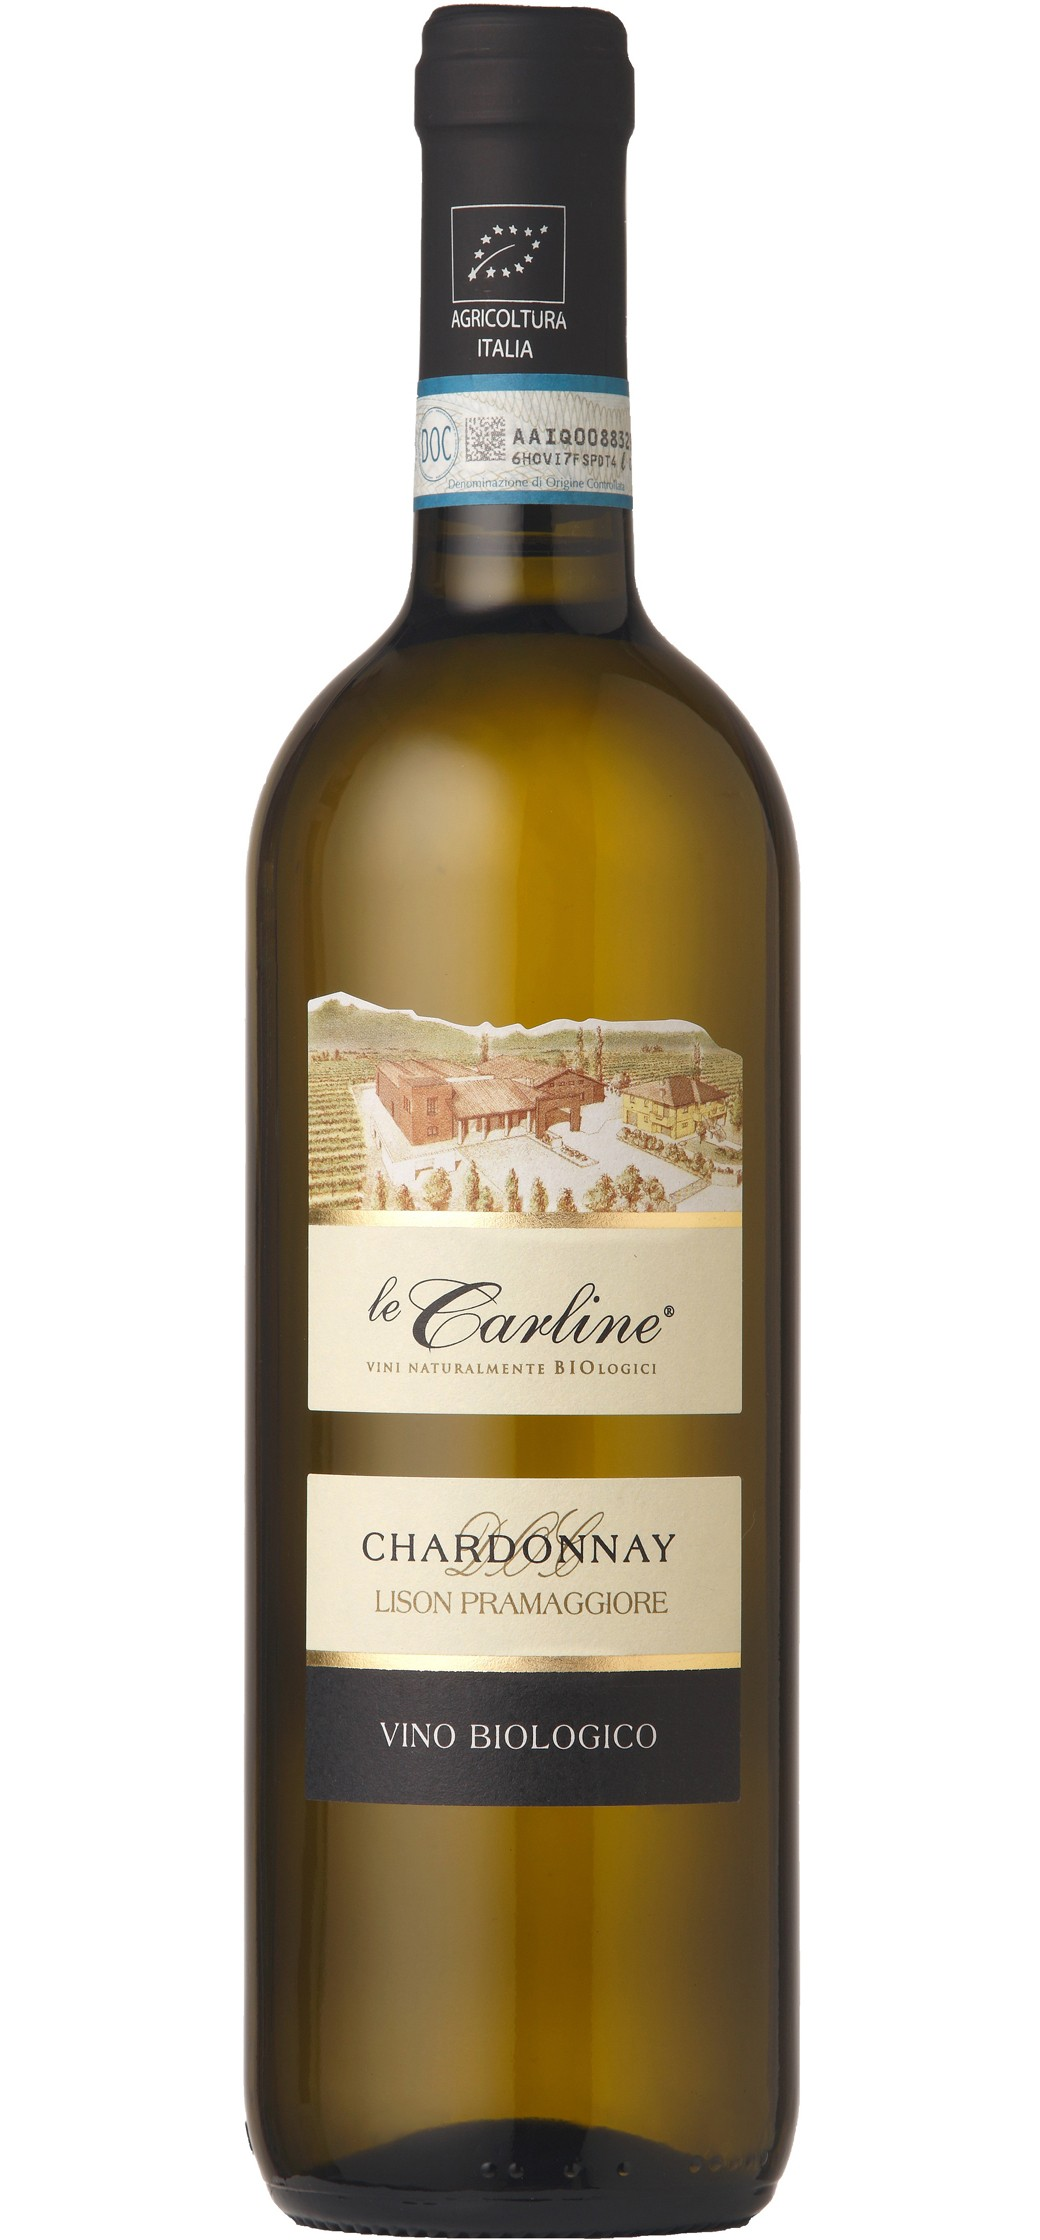 Chardonnay DOC Lison Pramaggiore